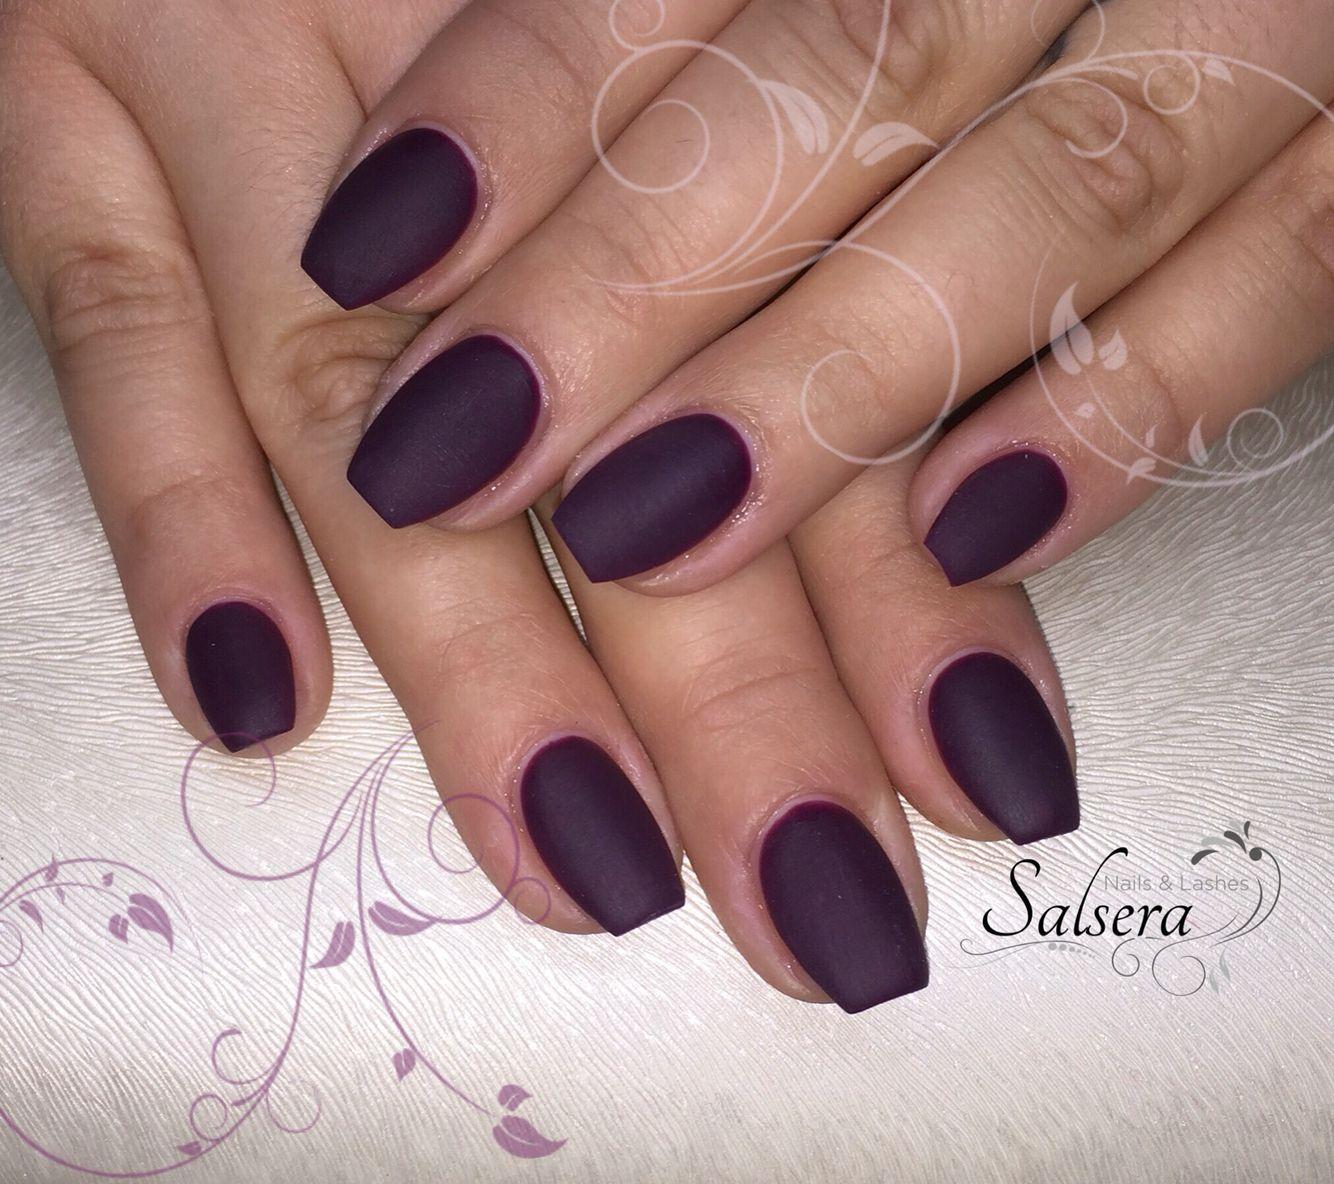 nails n gel ballerina matt plum lila bordeaux fullcover salsera nails lashes nails